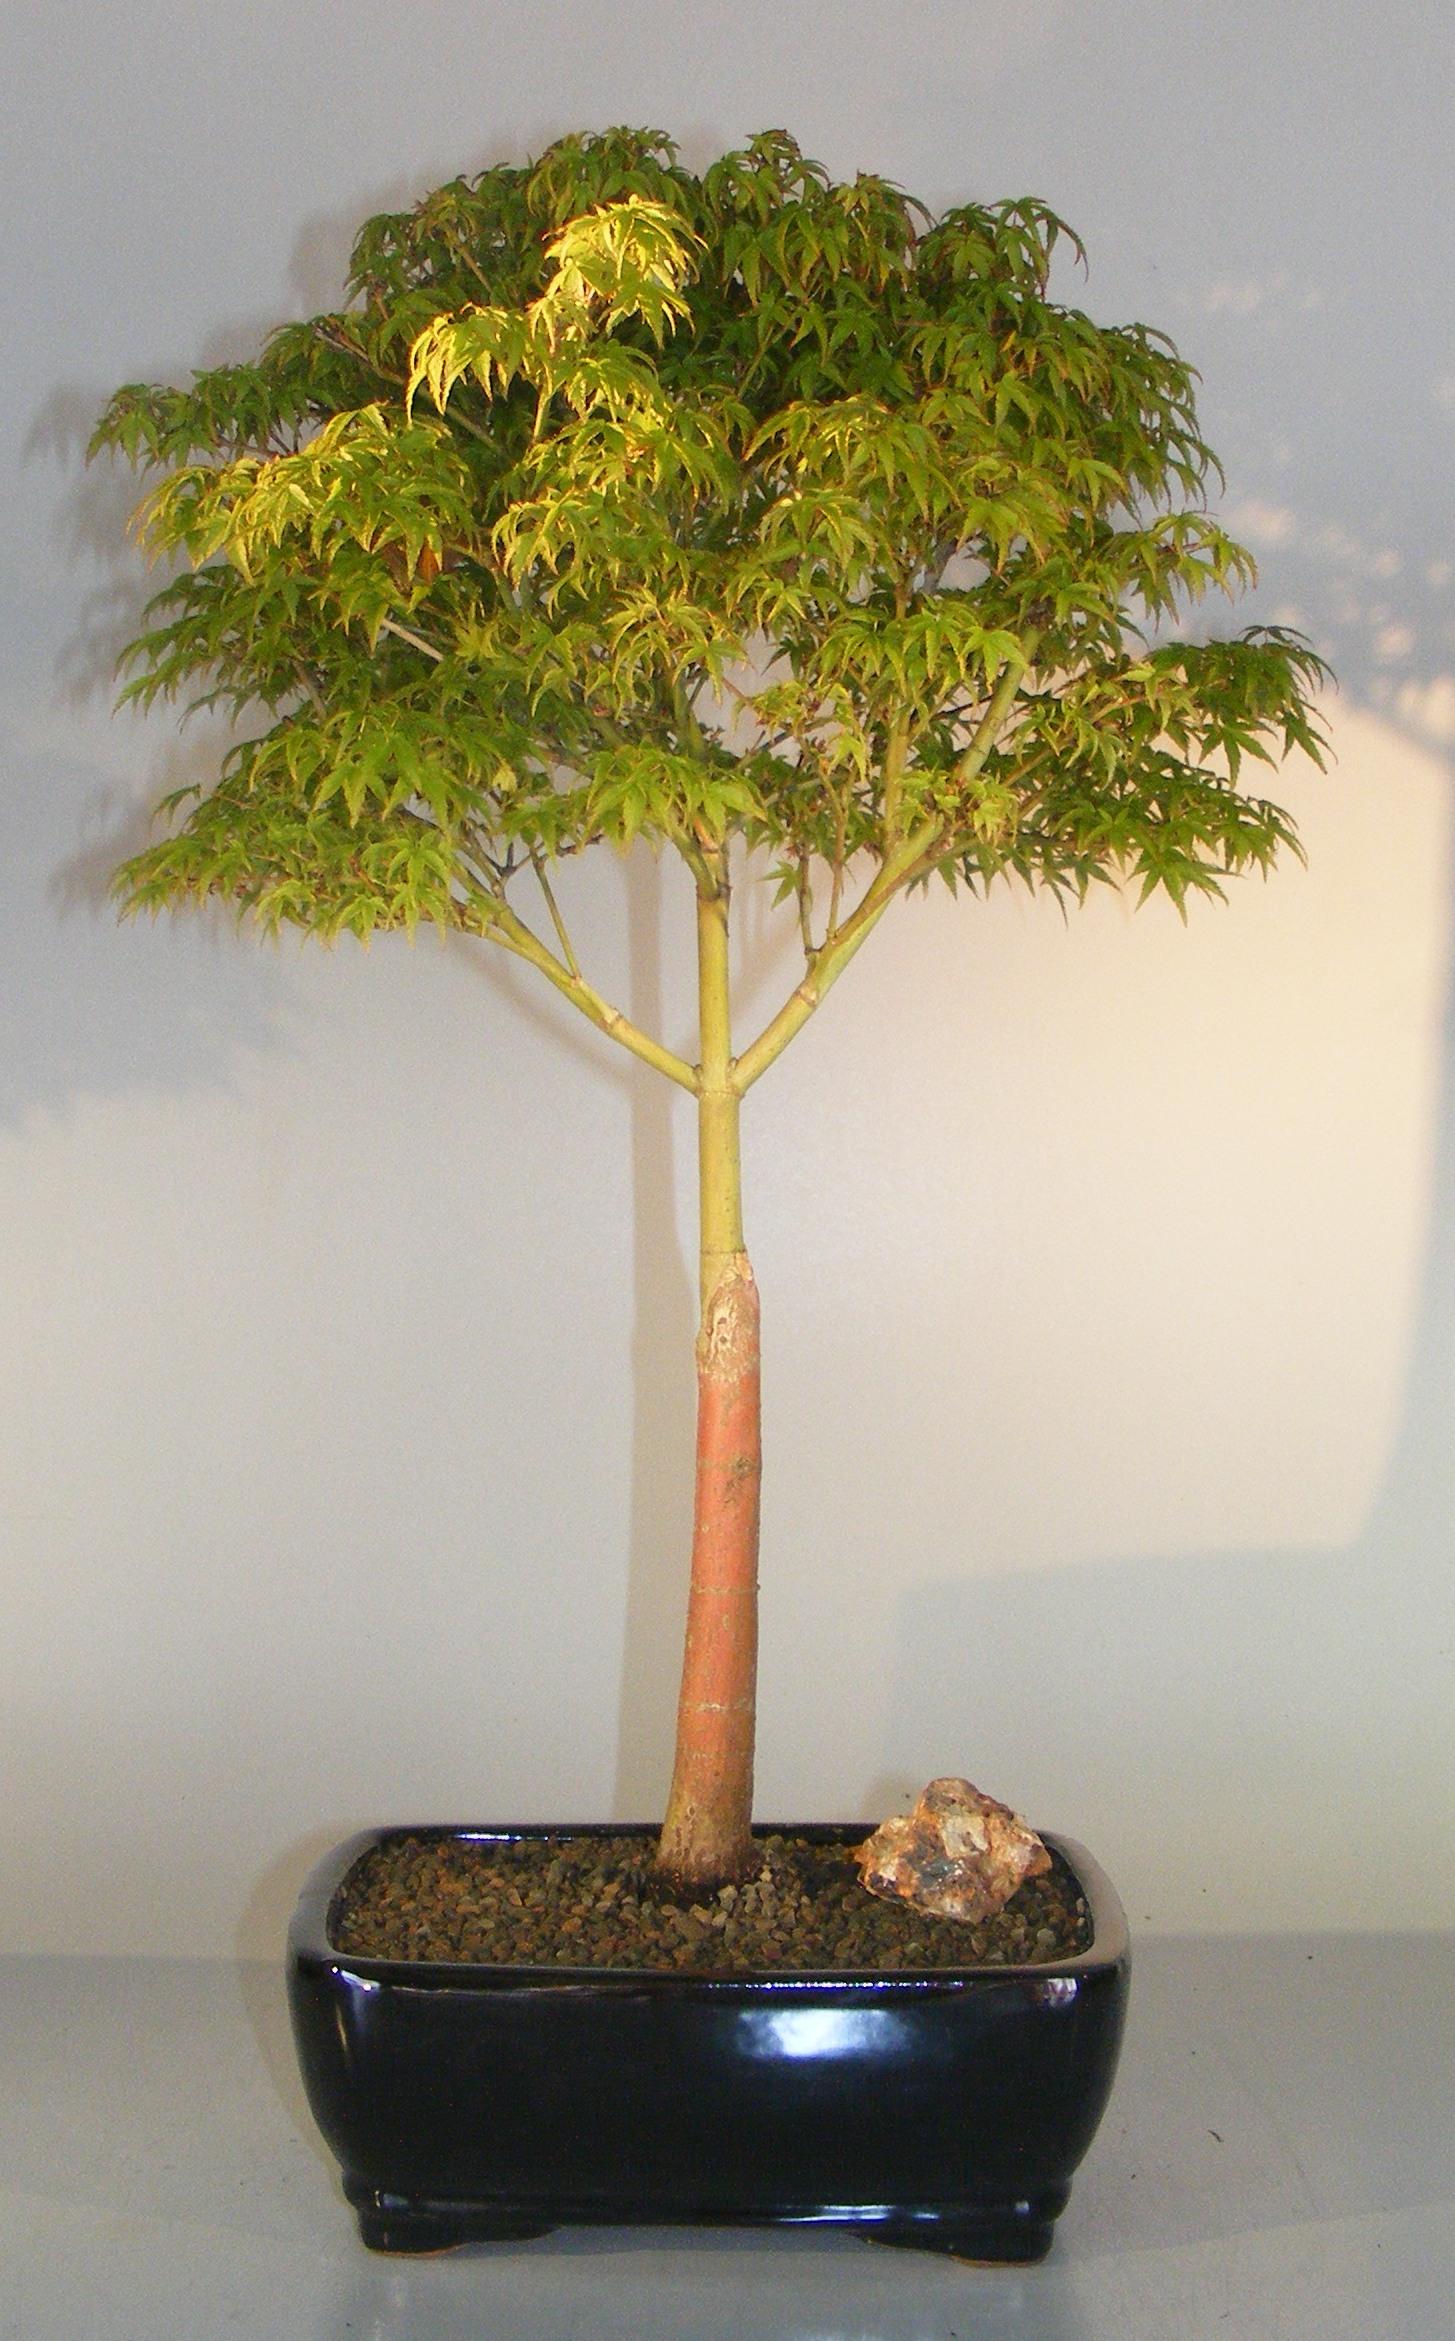 Dwarf Japanese Maple Bonsai Tree (acer palmatum 'Capercis Dwarf') Image